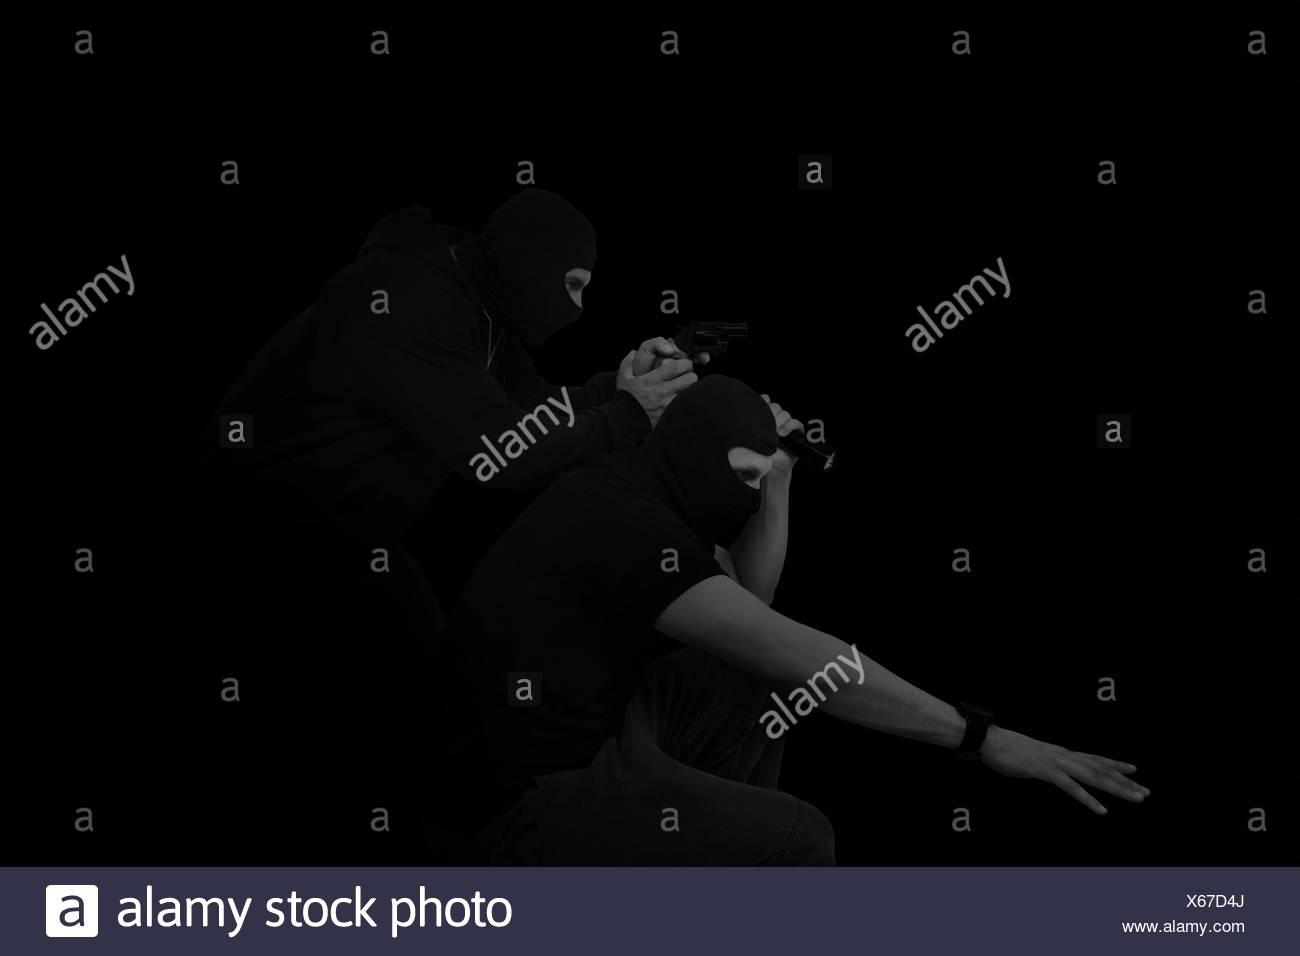 Thieves. - Stock Image